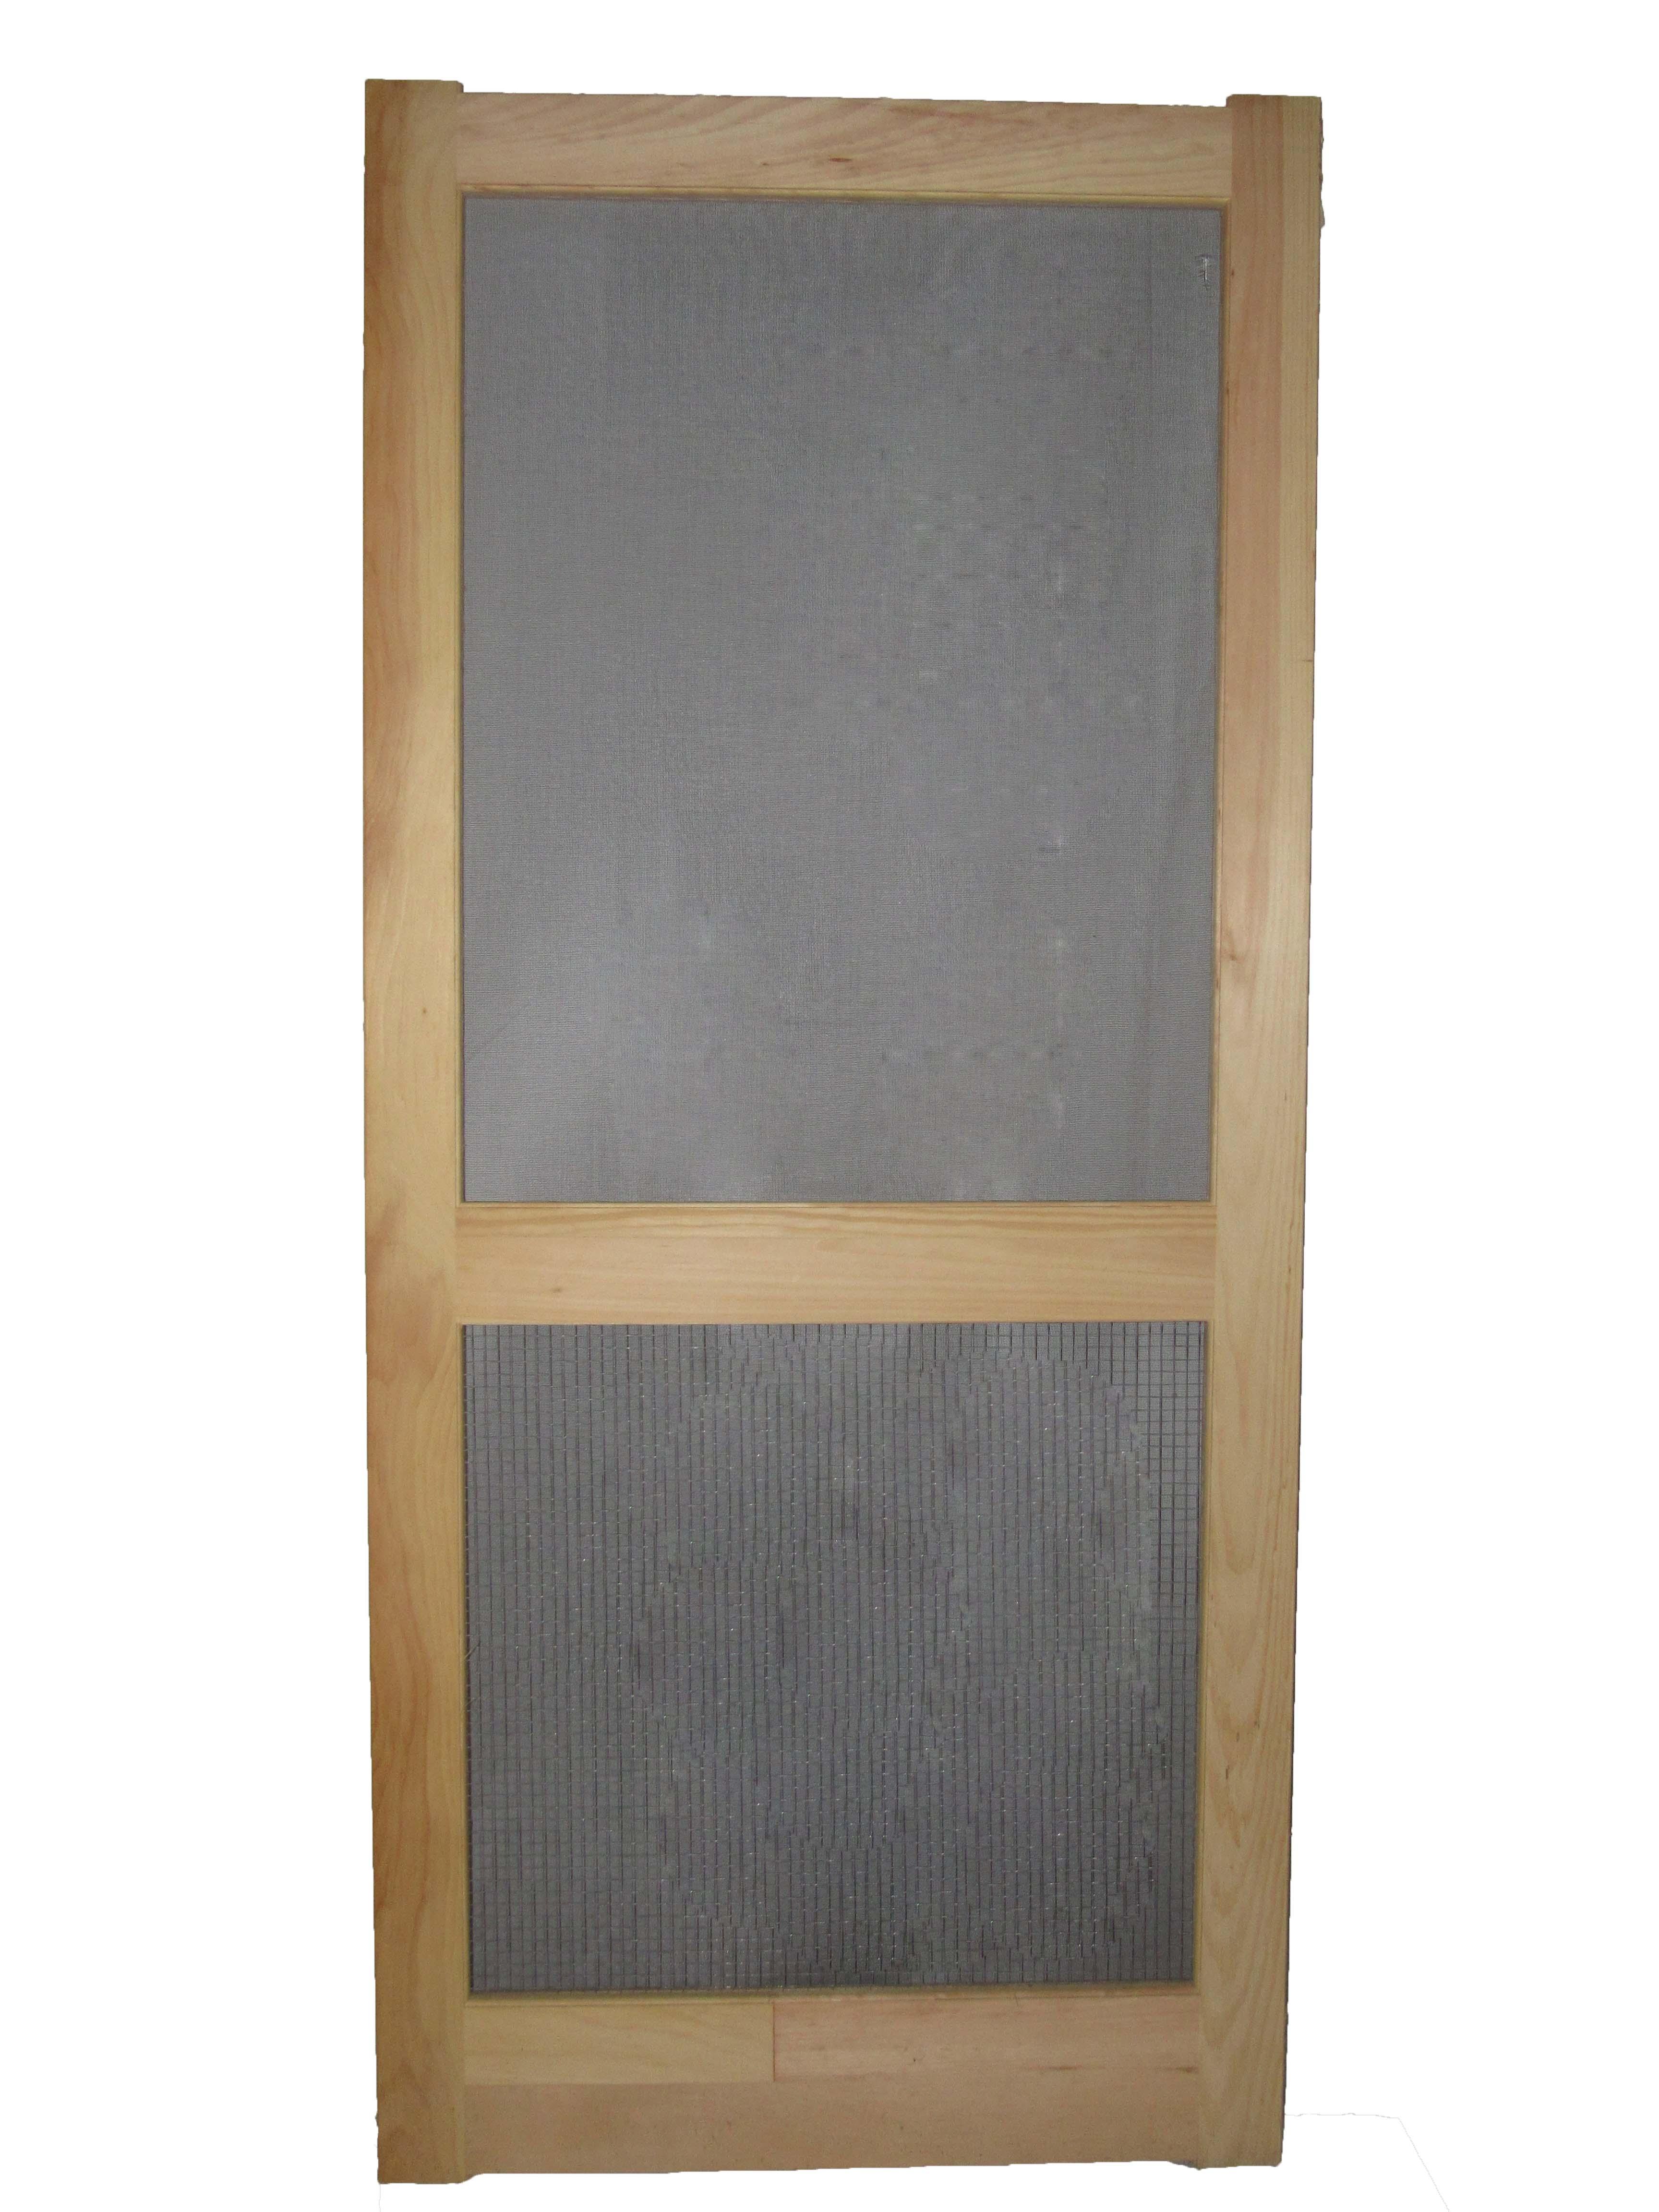 Paul Argoe Style 300 White Pine Screen Door With Hardware Cloth